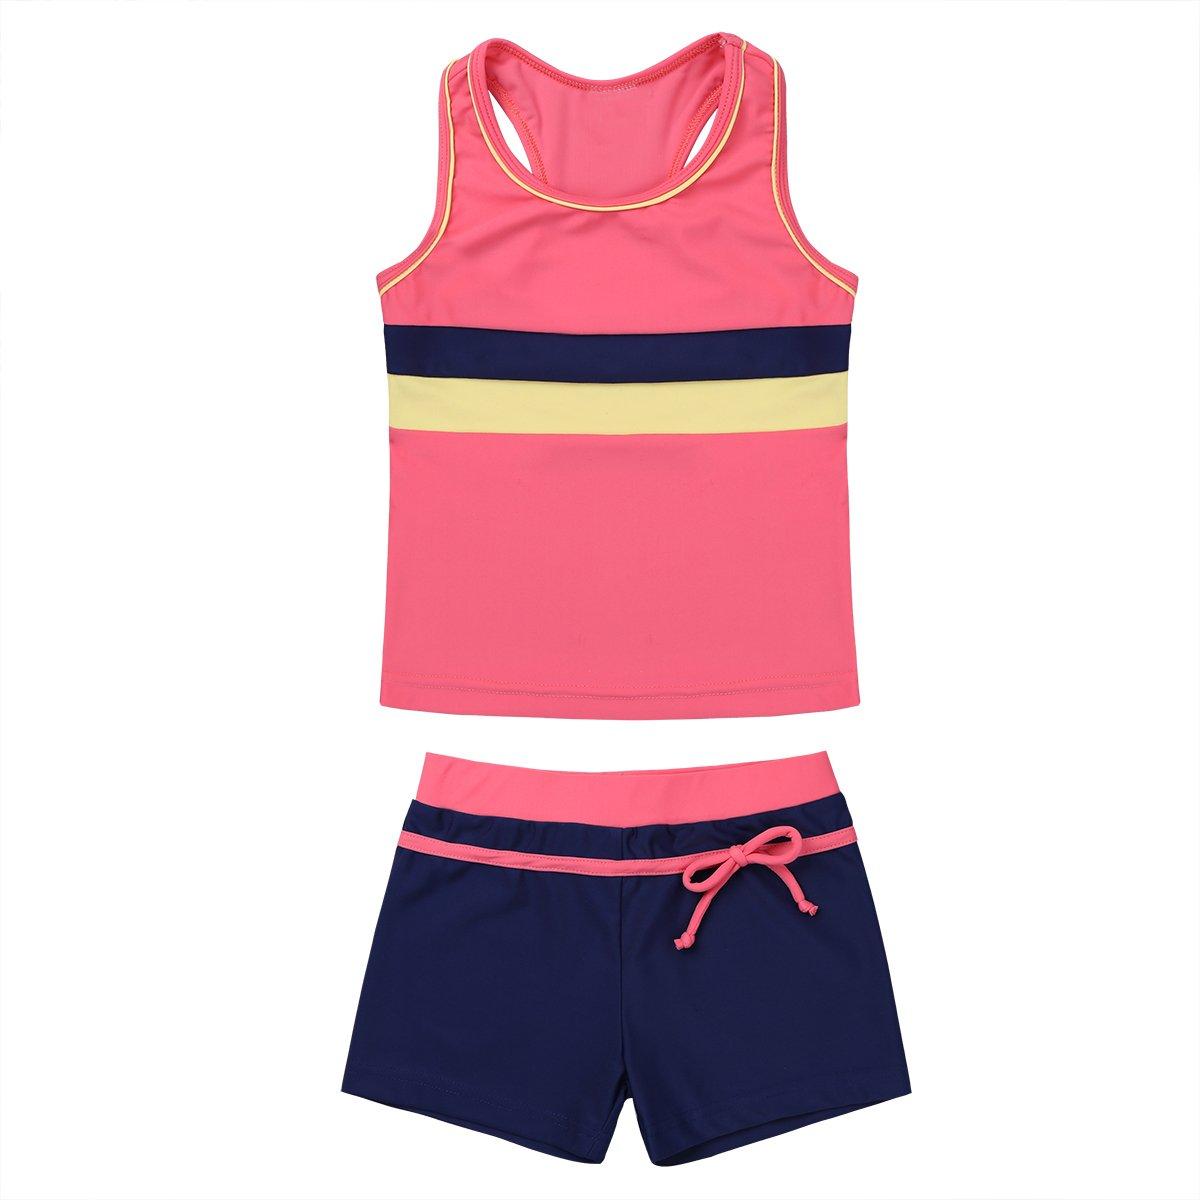 TiaoBug Little Girls' Summer Two Piece Boyshort Tankini Swimsuit Swimwear Watermelon Red 14